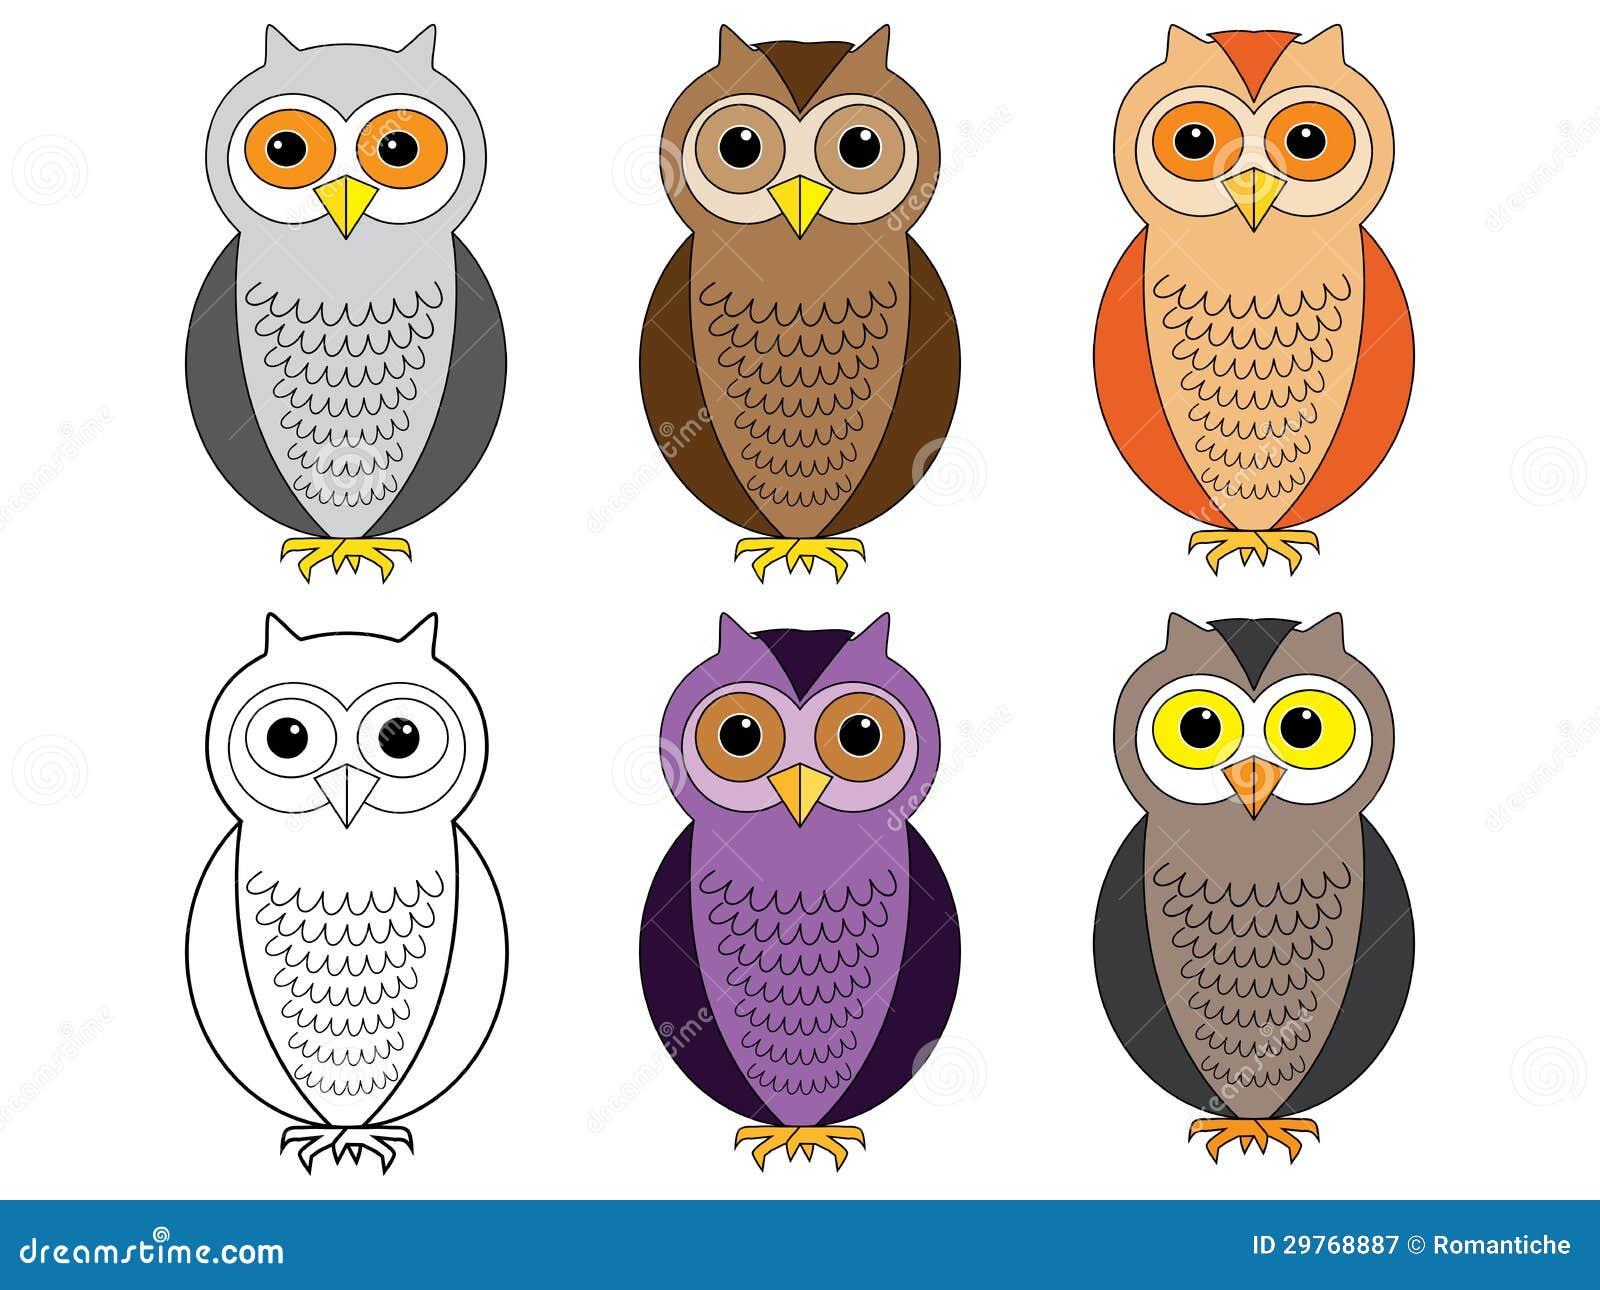 Cartoon Owls Royalty Free Stock Photography Image 29768887